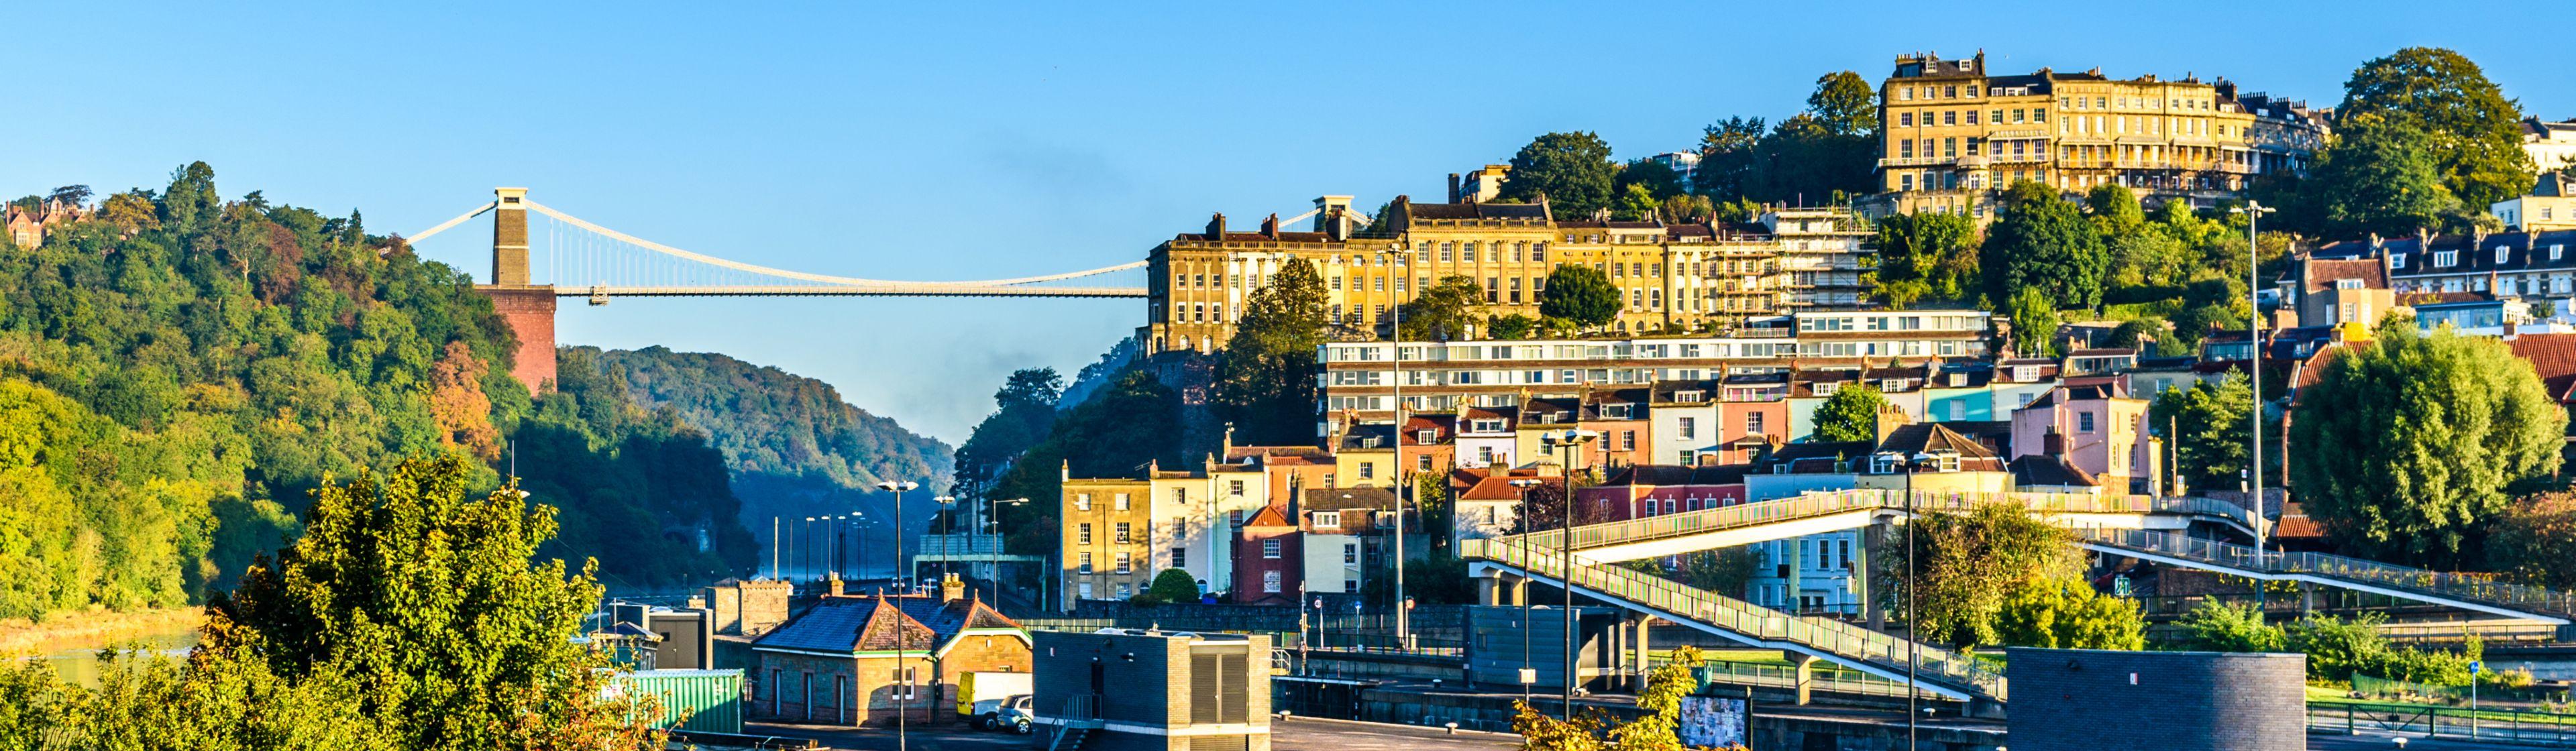 Clifton village with suspension bridge